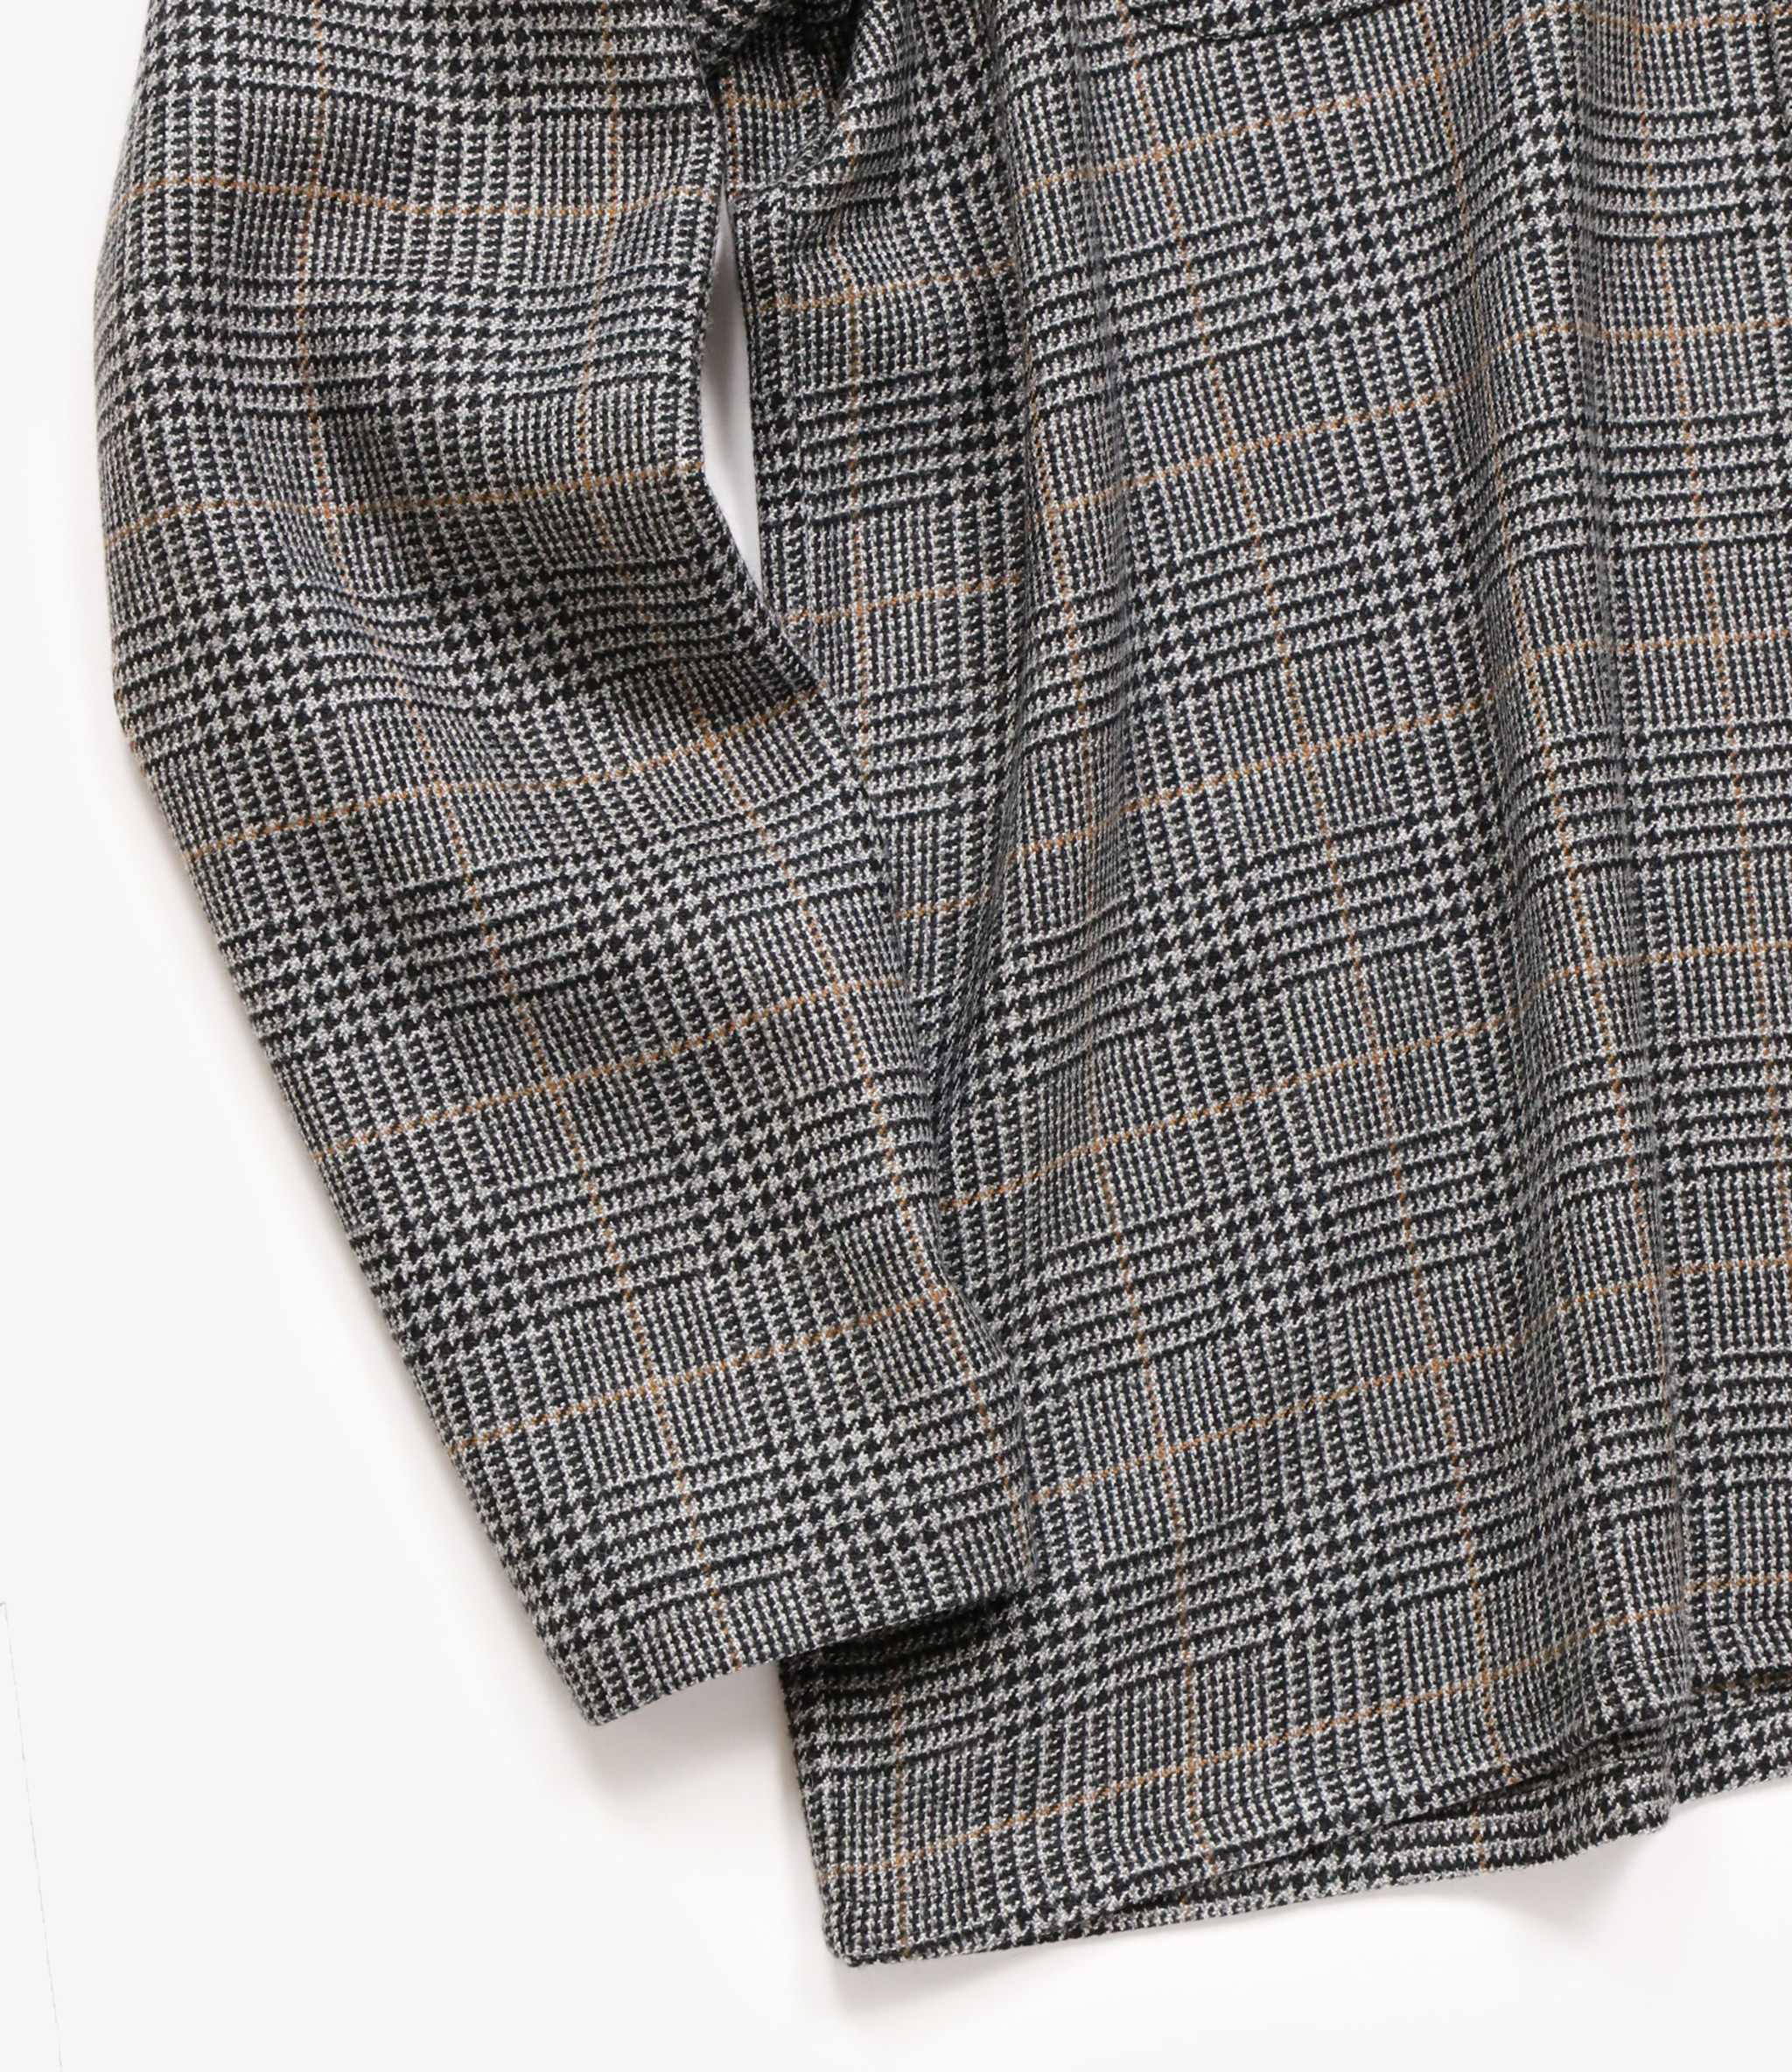 Needles One-Up Cowboy Shirt - Pe/R/W/Pu Glen Plaid - Grey